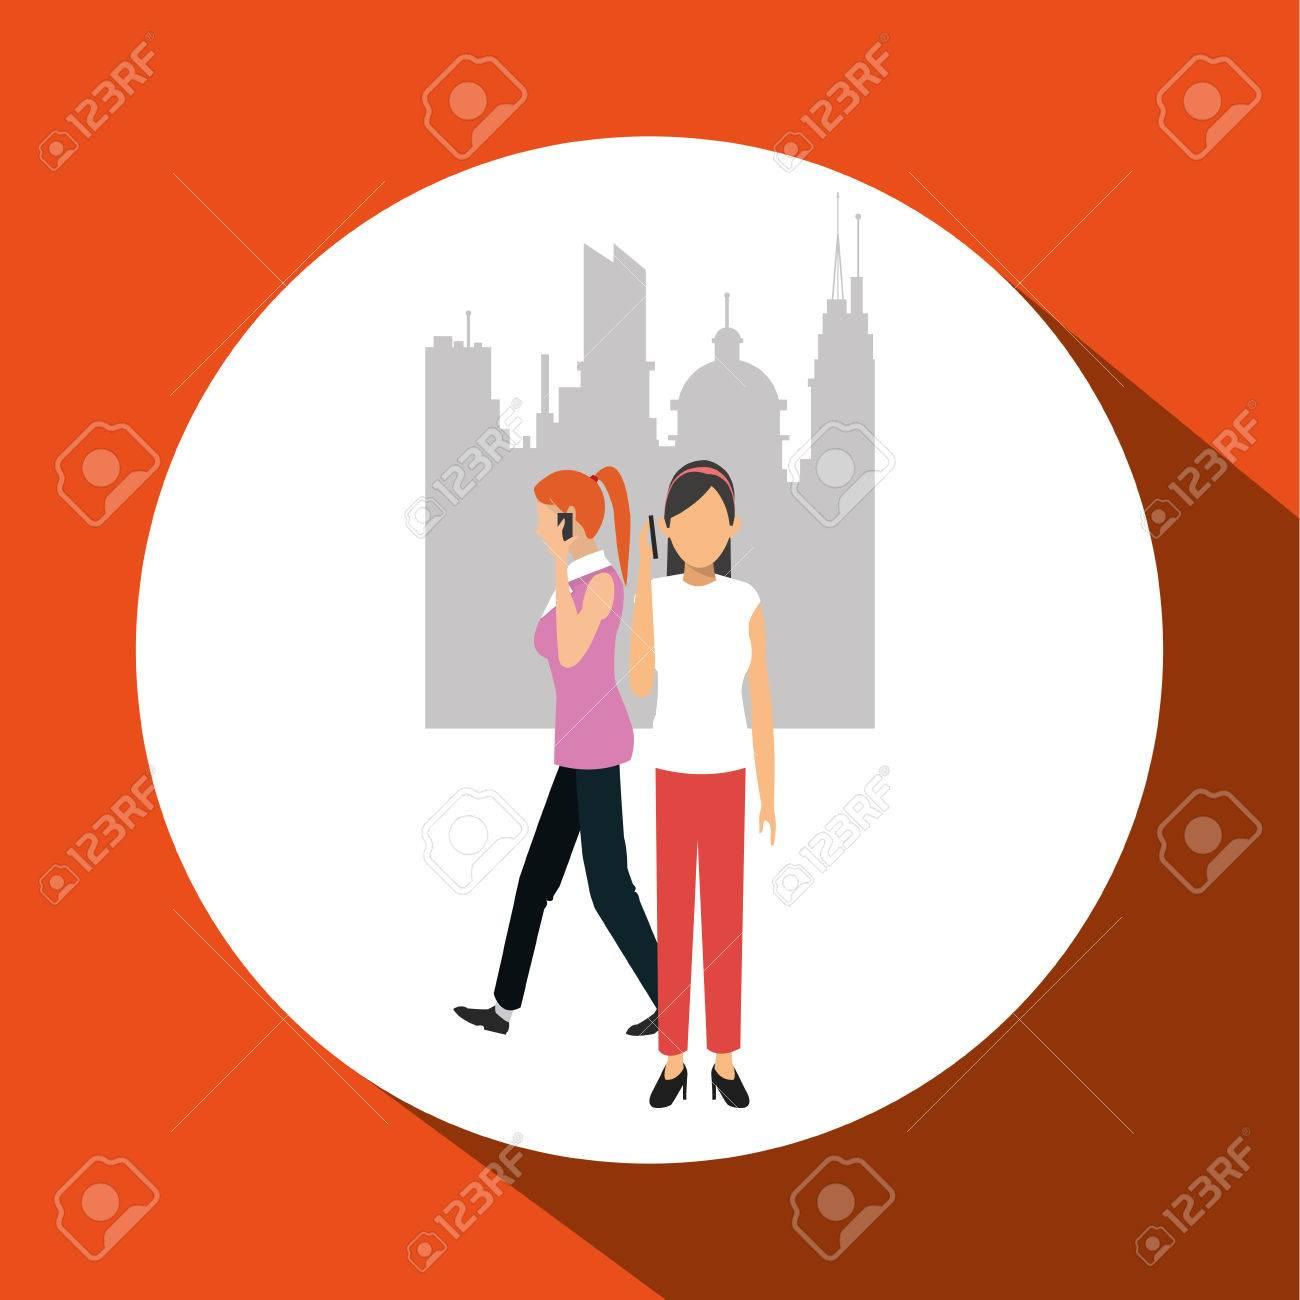 Dating grafico matrimonio non incontri EP 11 Anteprima